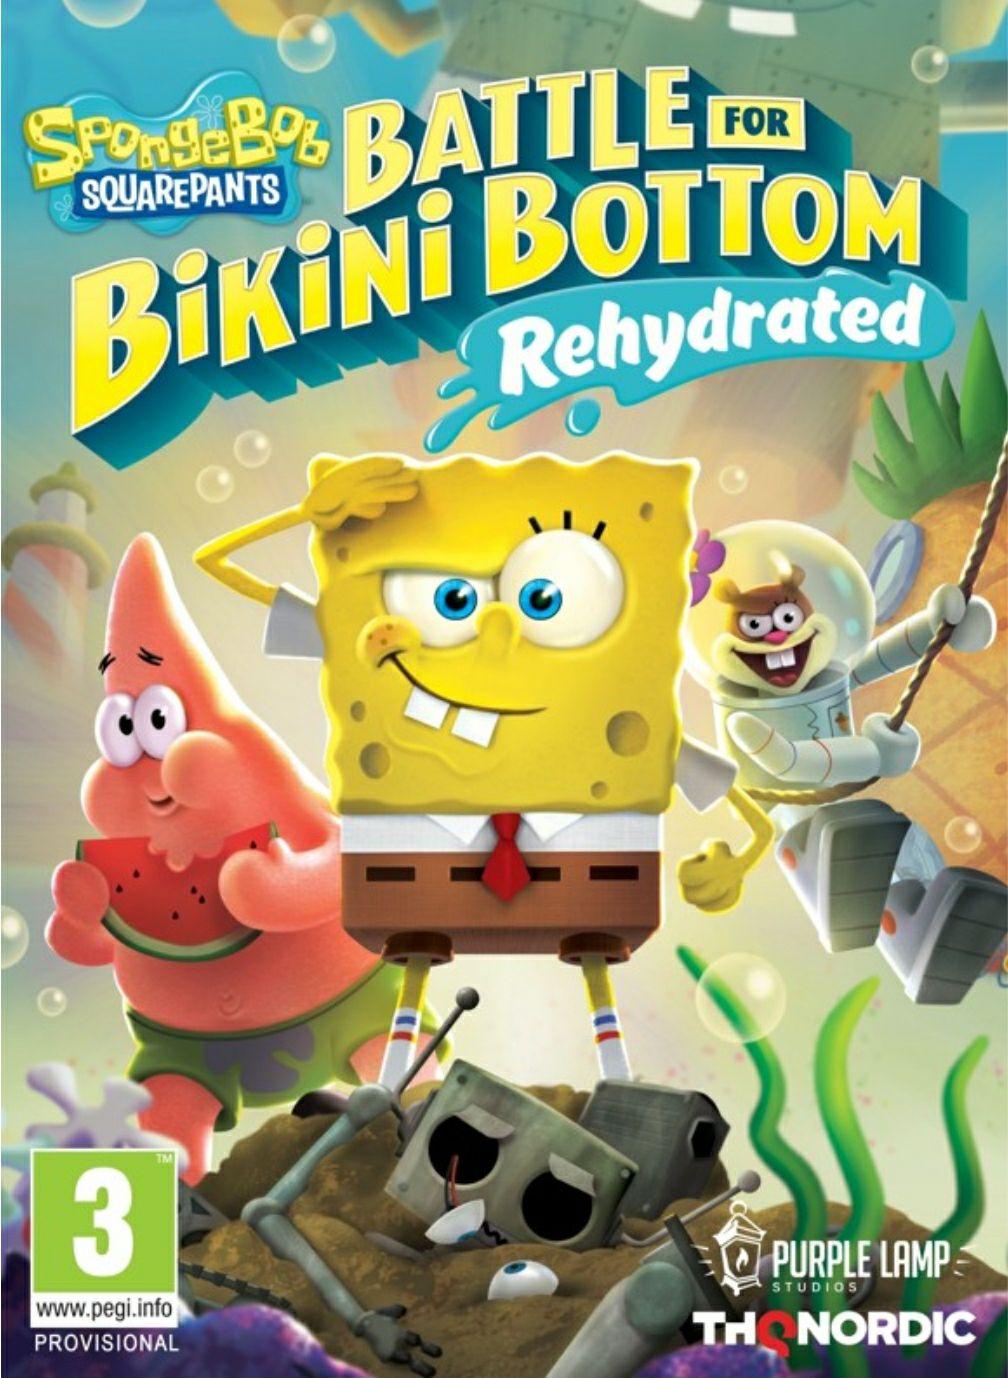 Spongebob SquarePants: Battle for Bikini Bottom Rehydrated für Nintendo Switch und Playstation 4